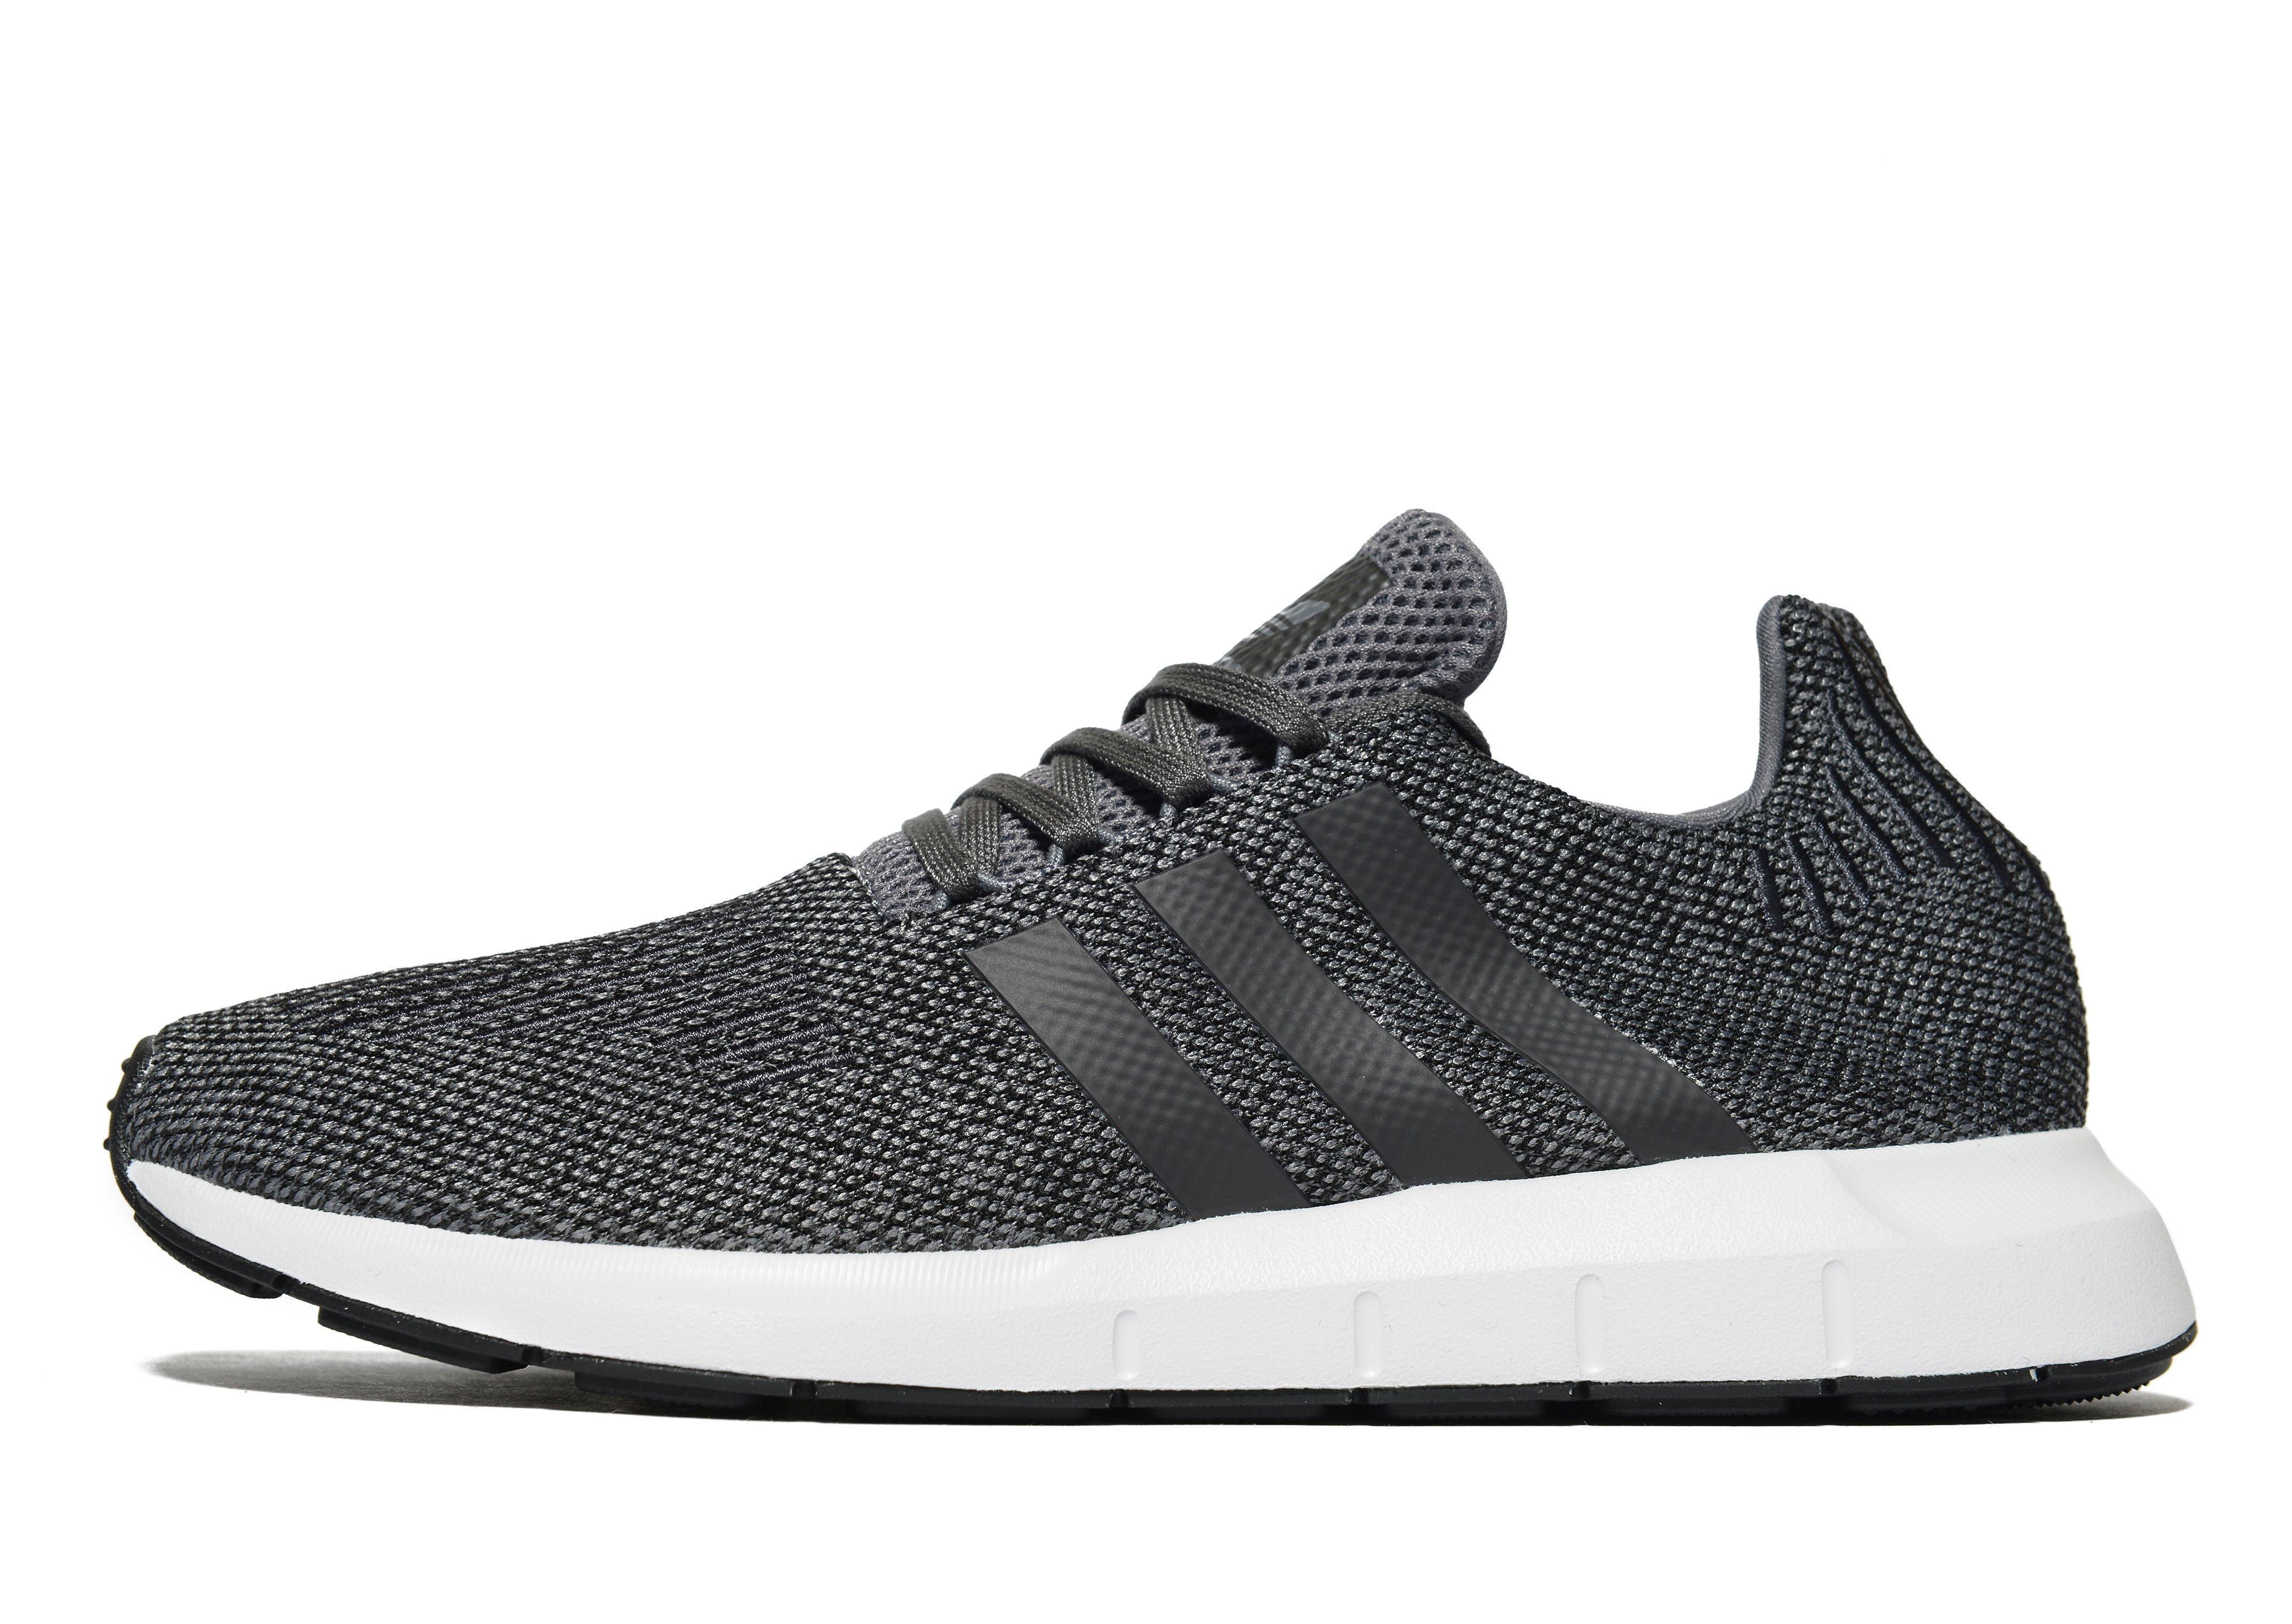 official photos 9ac60 930d1 Adidas Originals Swift Run in Gray for Men - Lyst